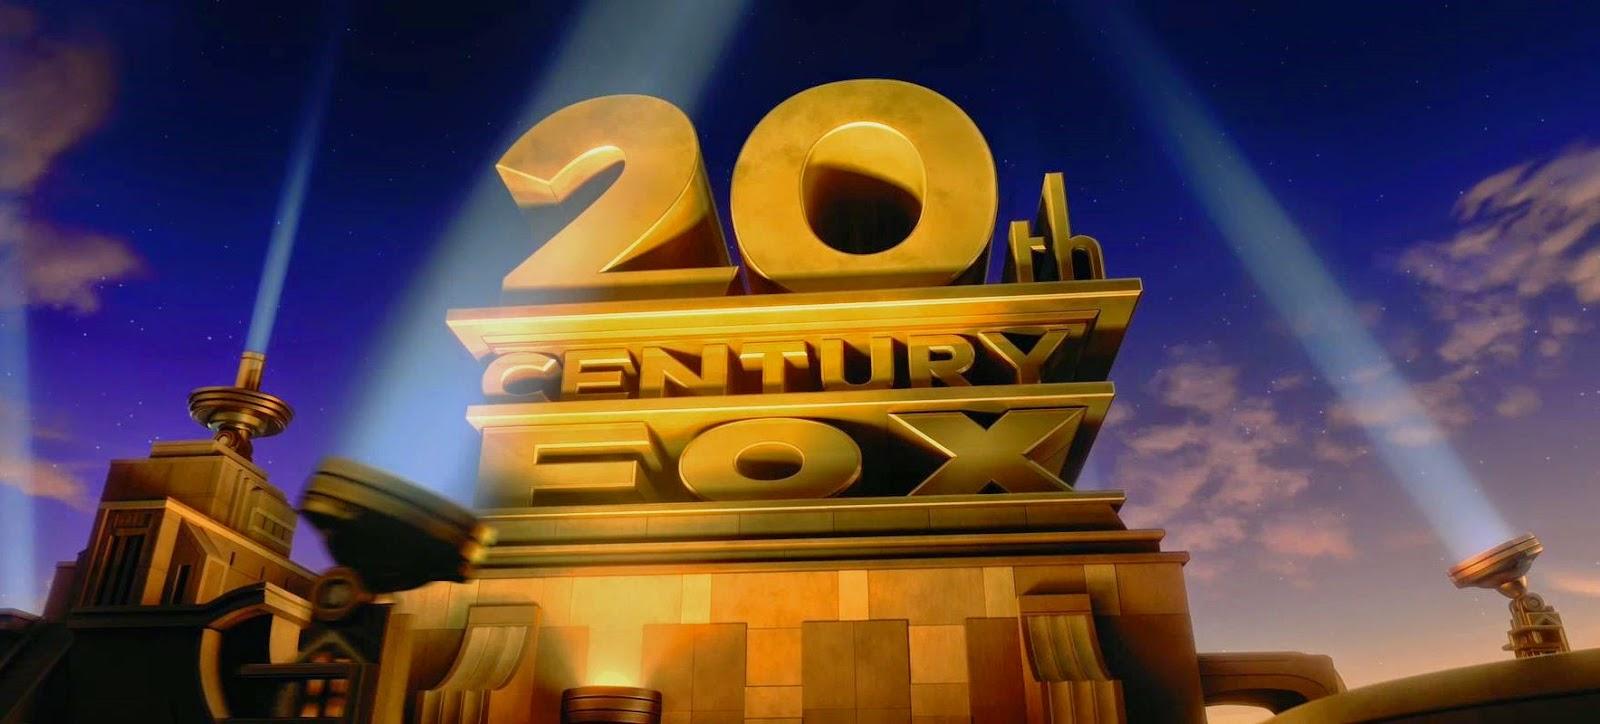 Fox Film do Brasil ultrapassa marca histórica de maior bilheteria do país